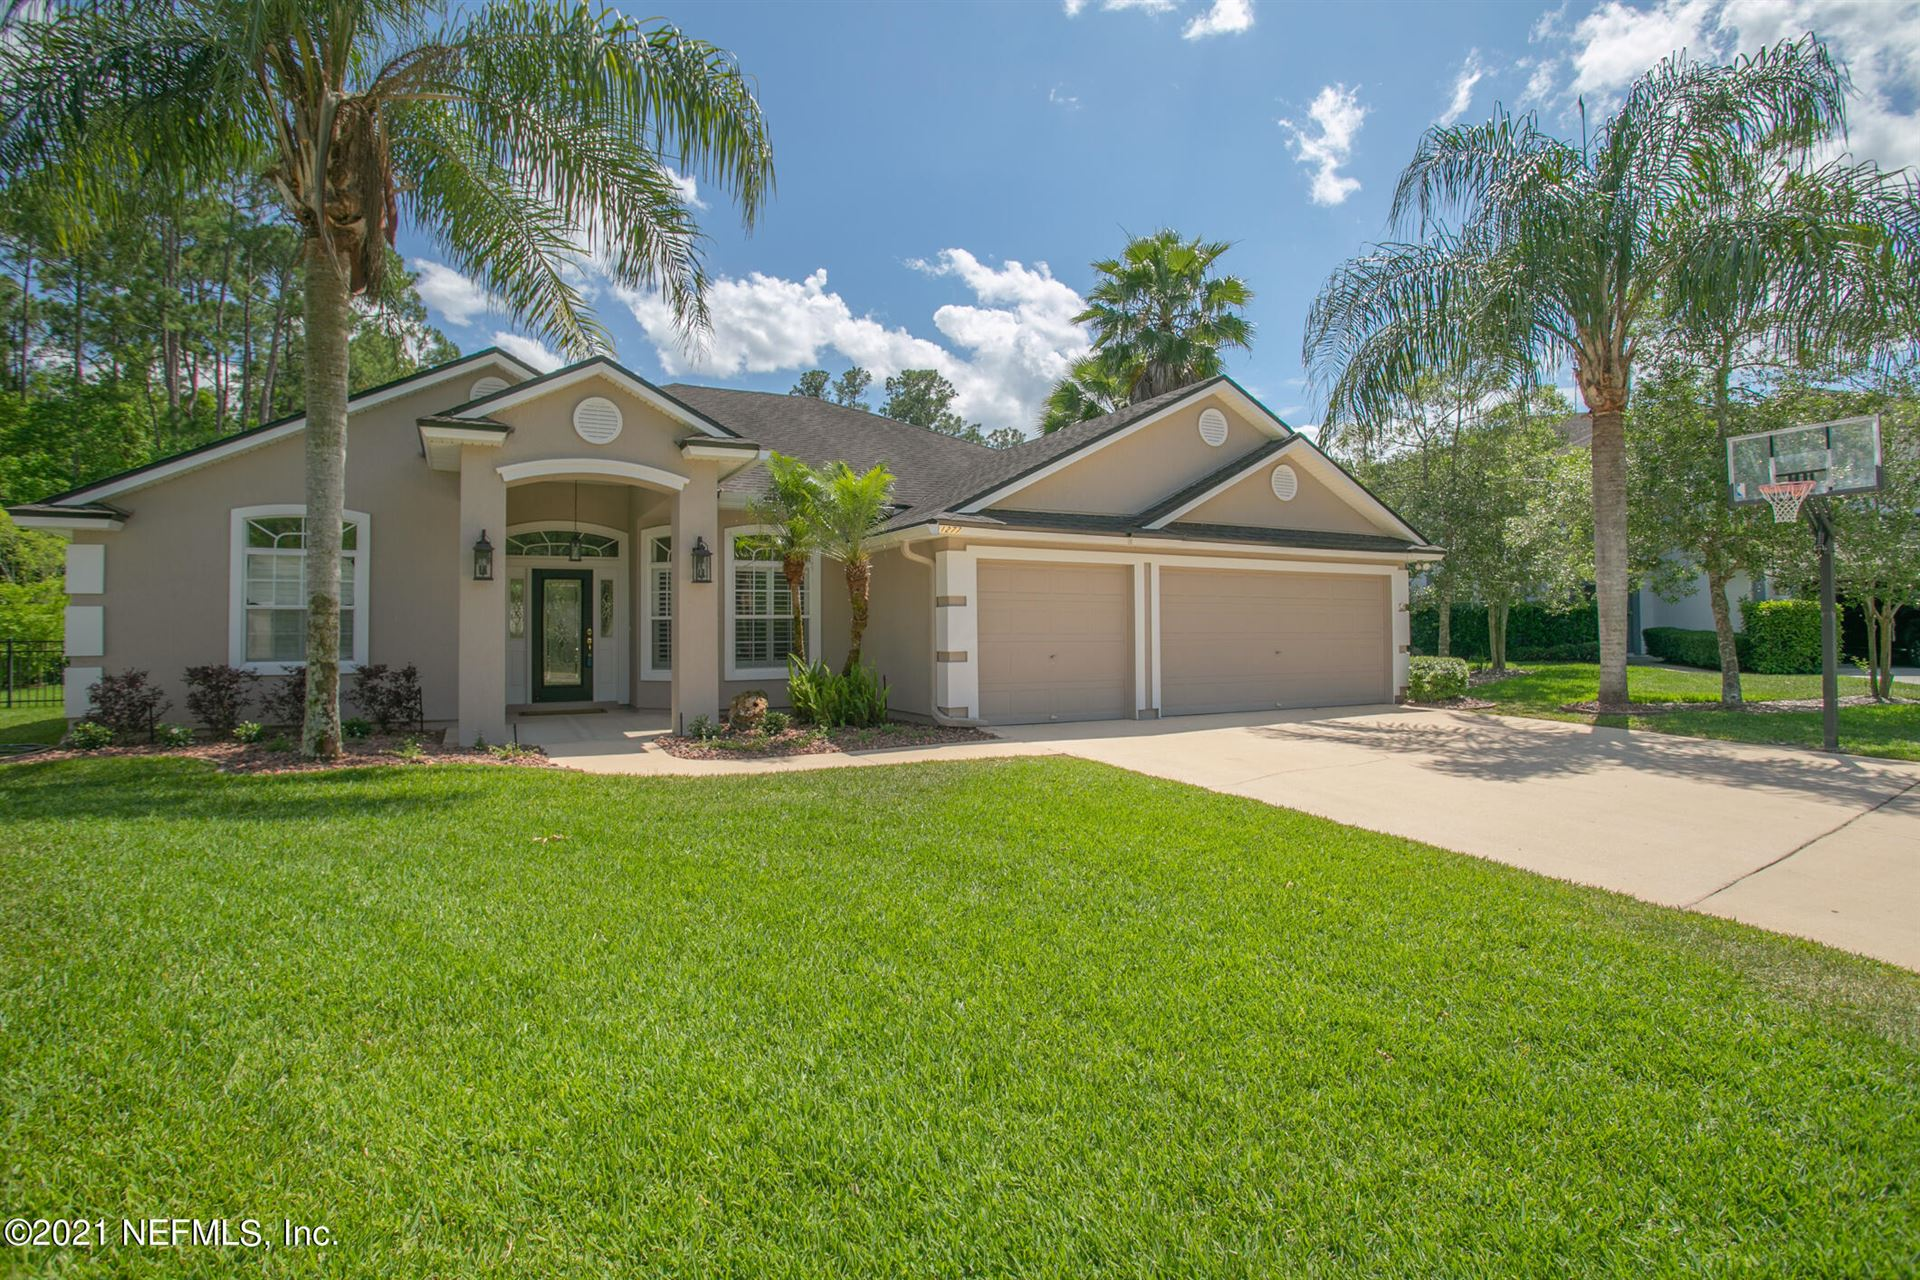 1277 RIBBON RD #Lot No: 24, Fruit Cove, FL 32259 - MLS#: 1108830